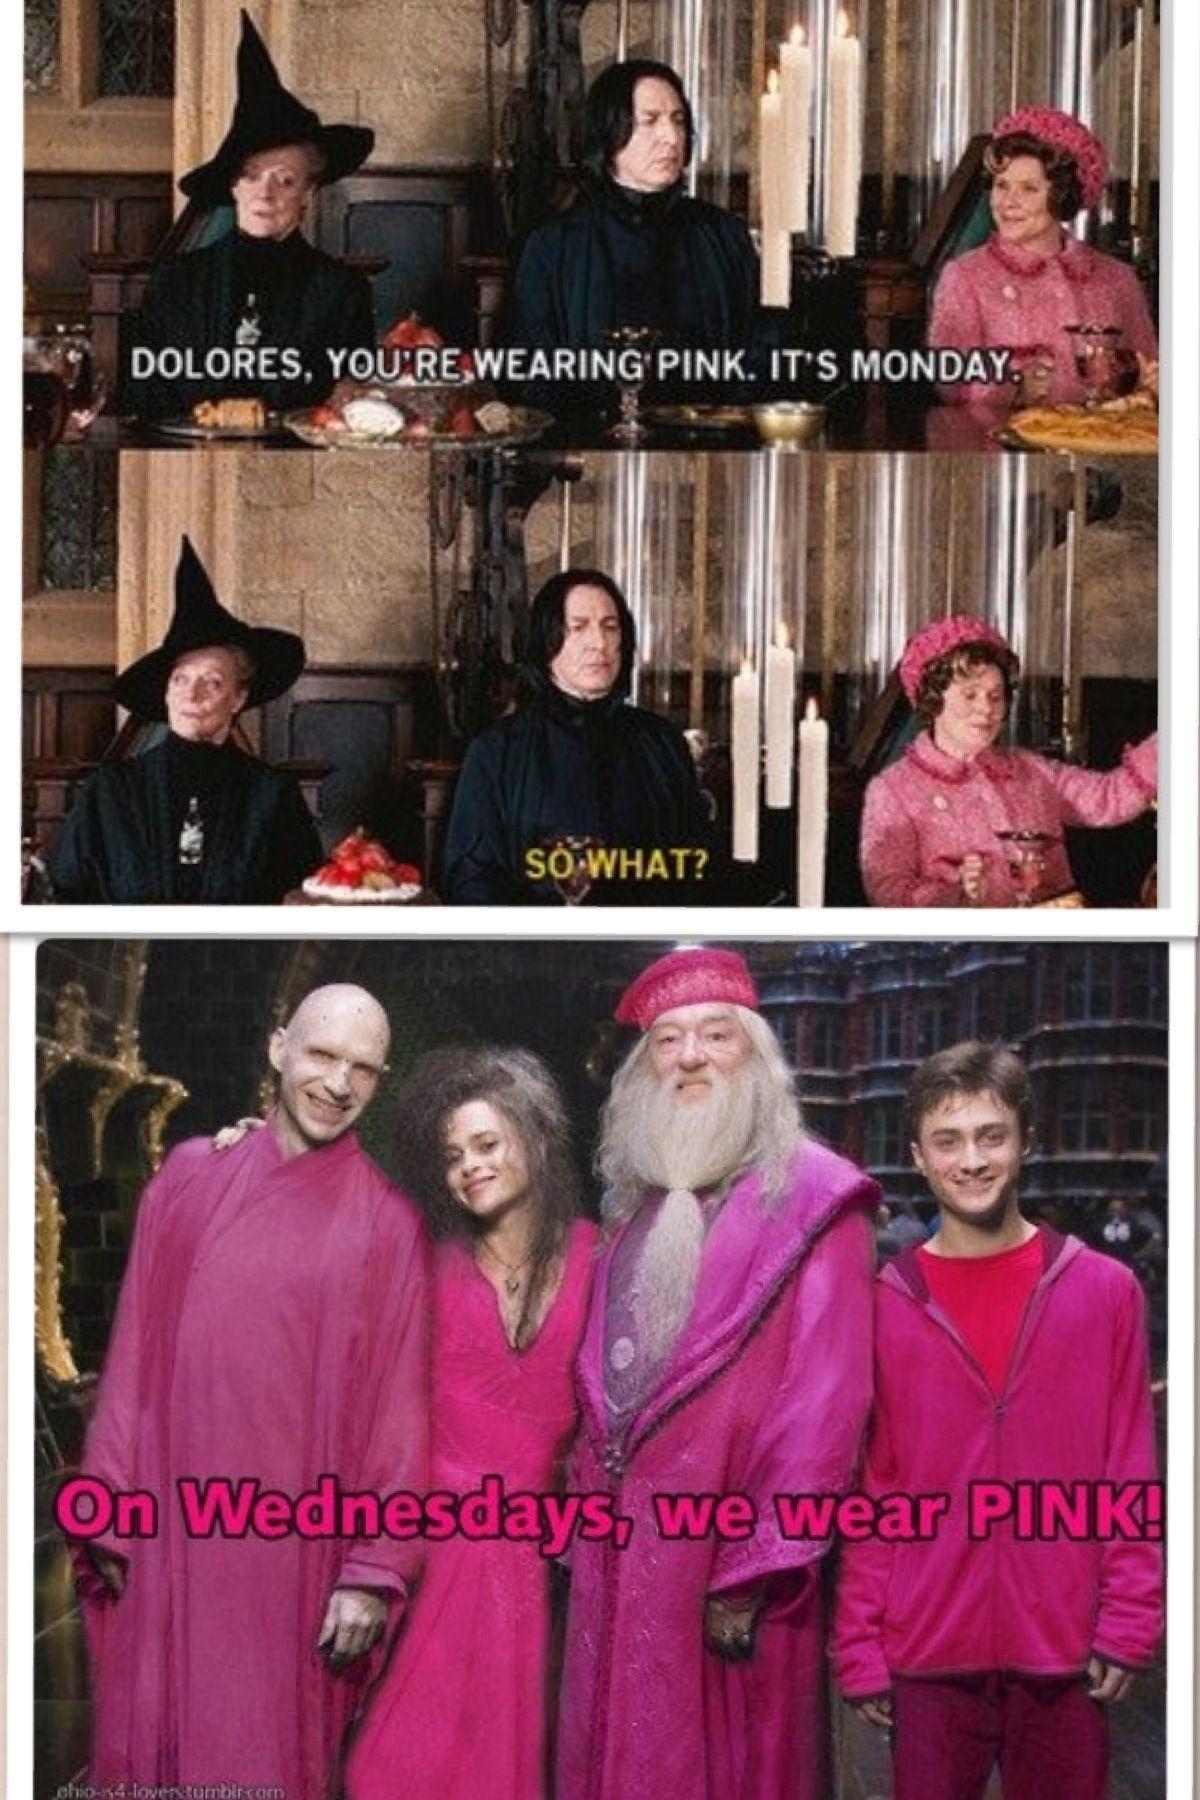 On Wednesdays we wear PINK!! BAHAHAHAHA IM DYING 😂😂